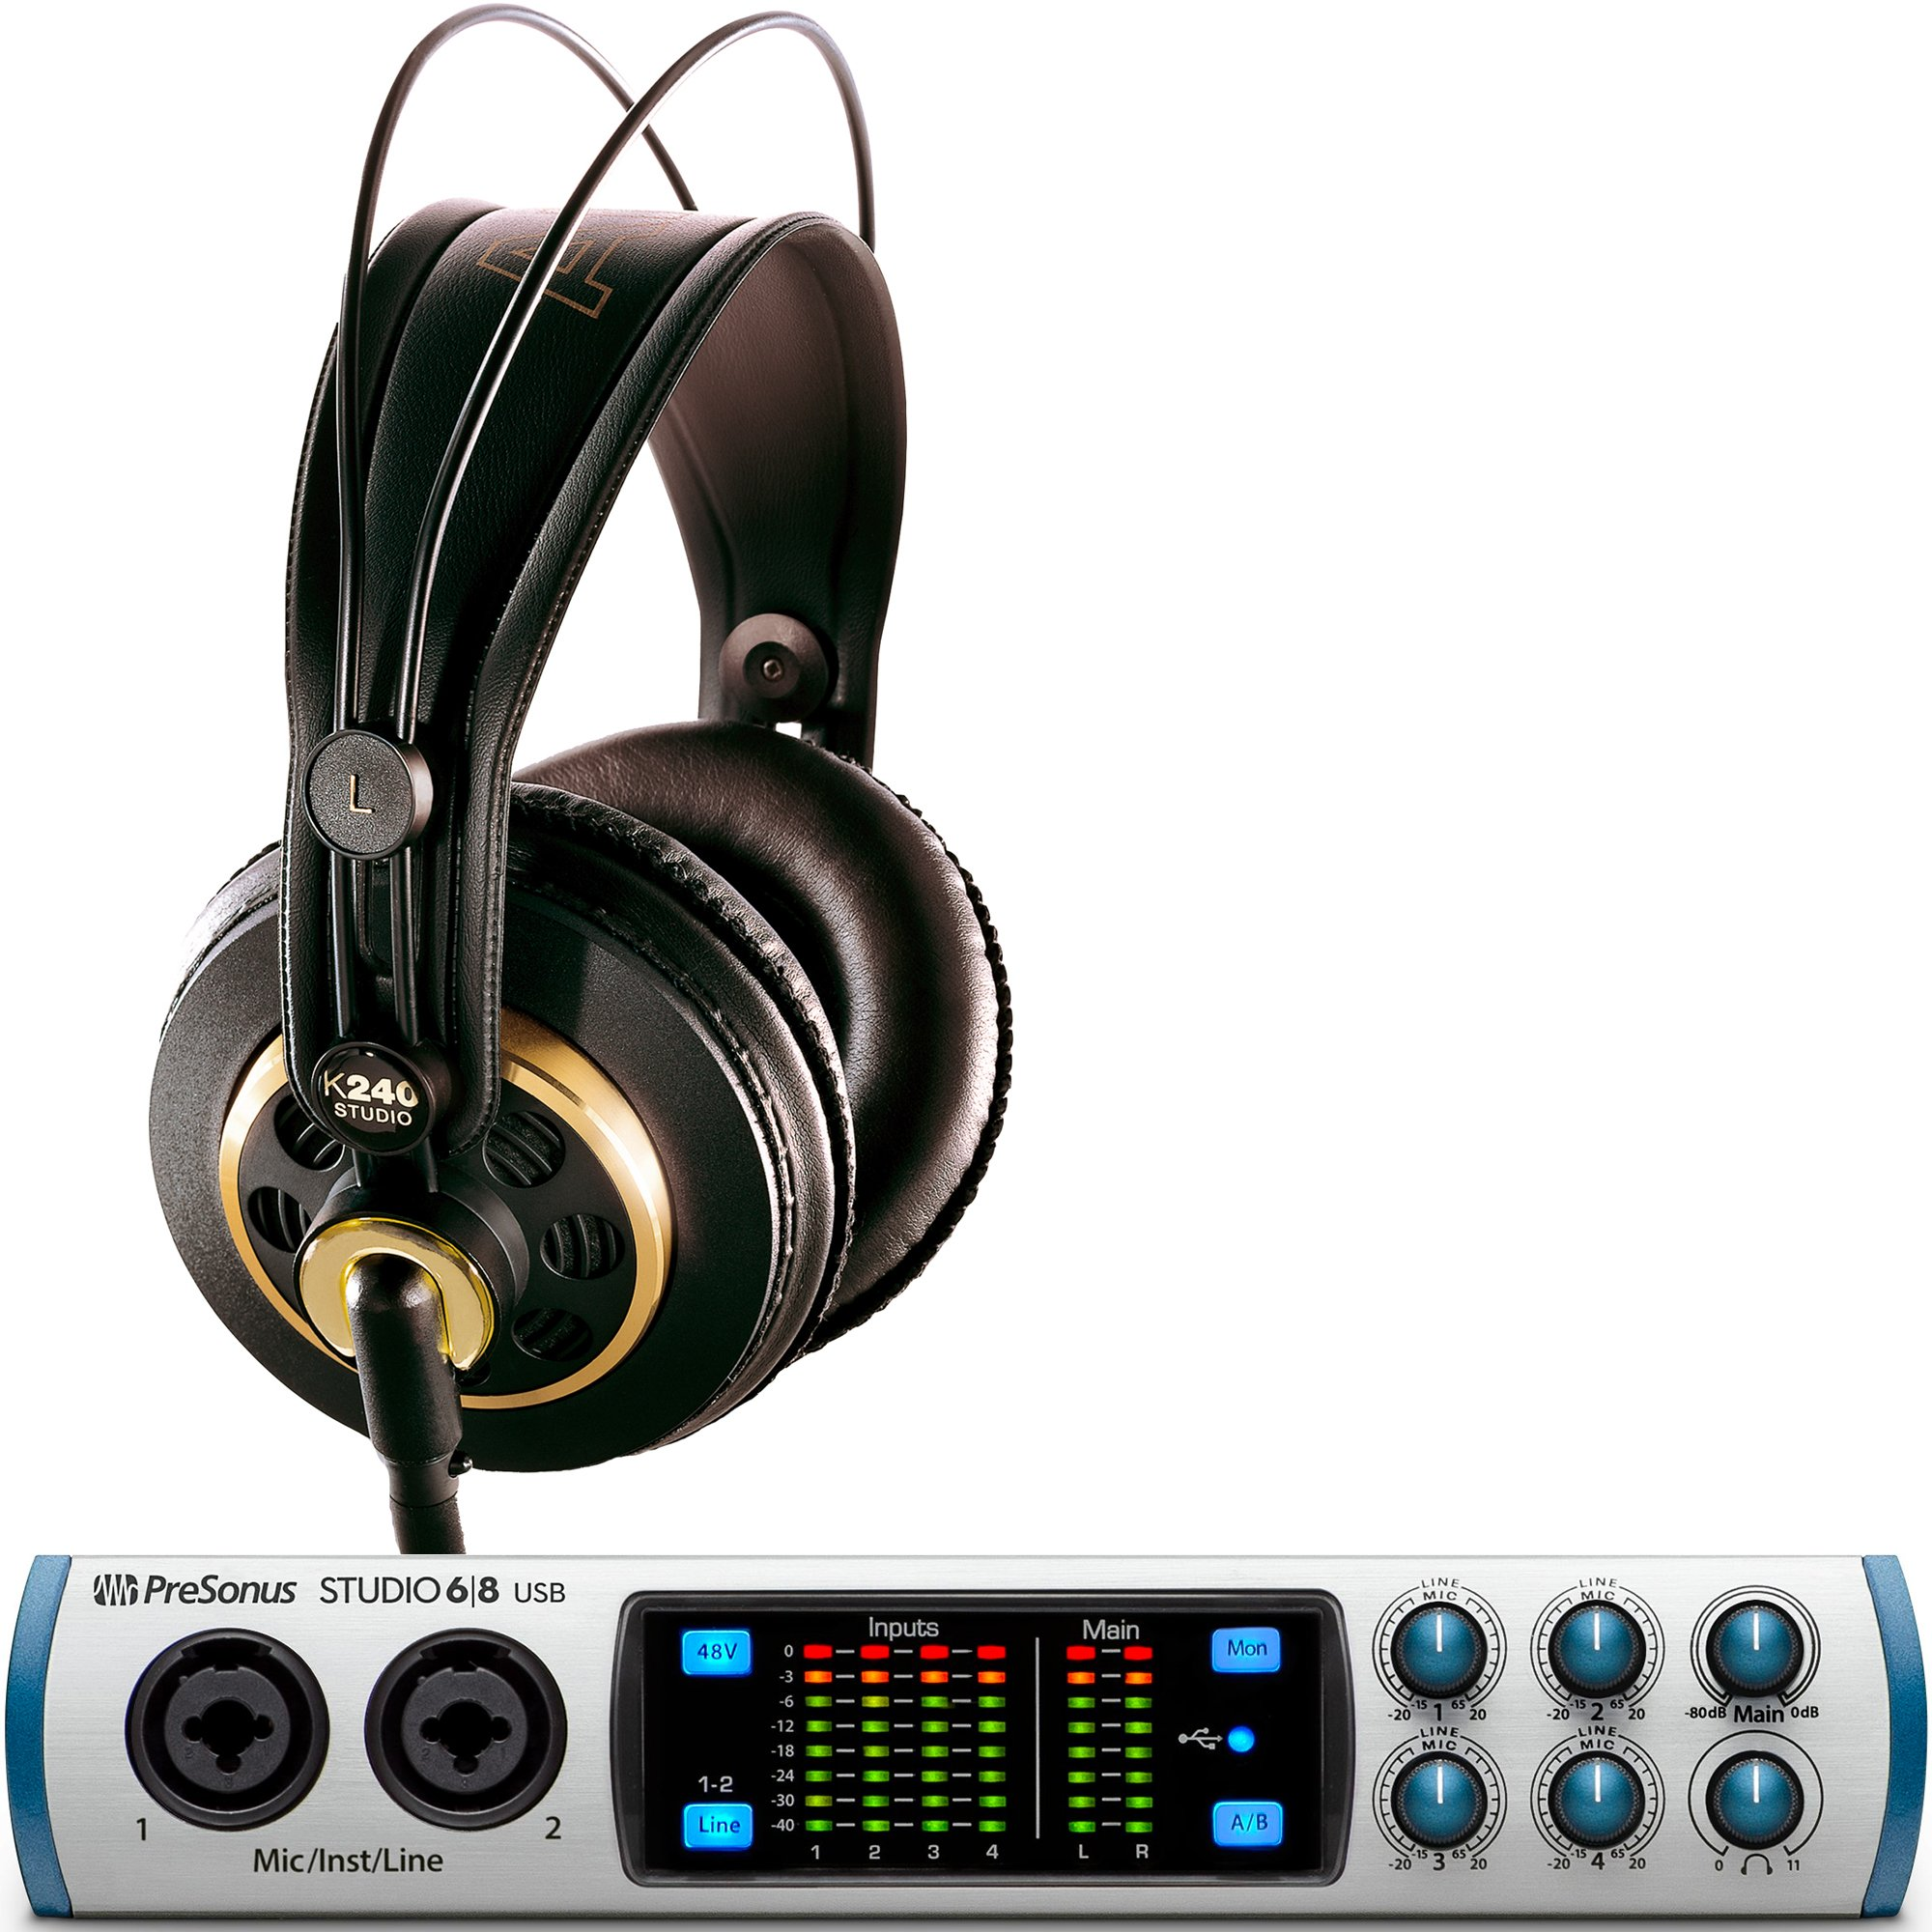 Presonus Studio 68 Audio Interface with AKG K240 Studio Headphones